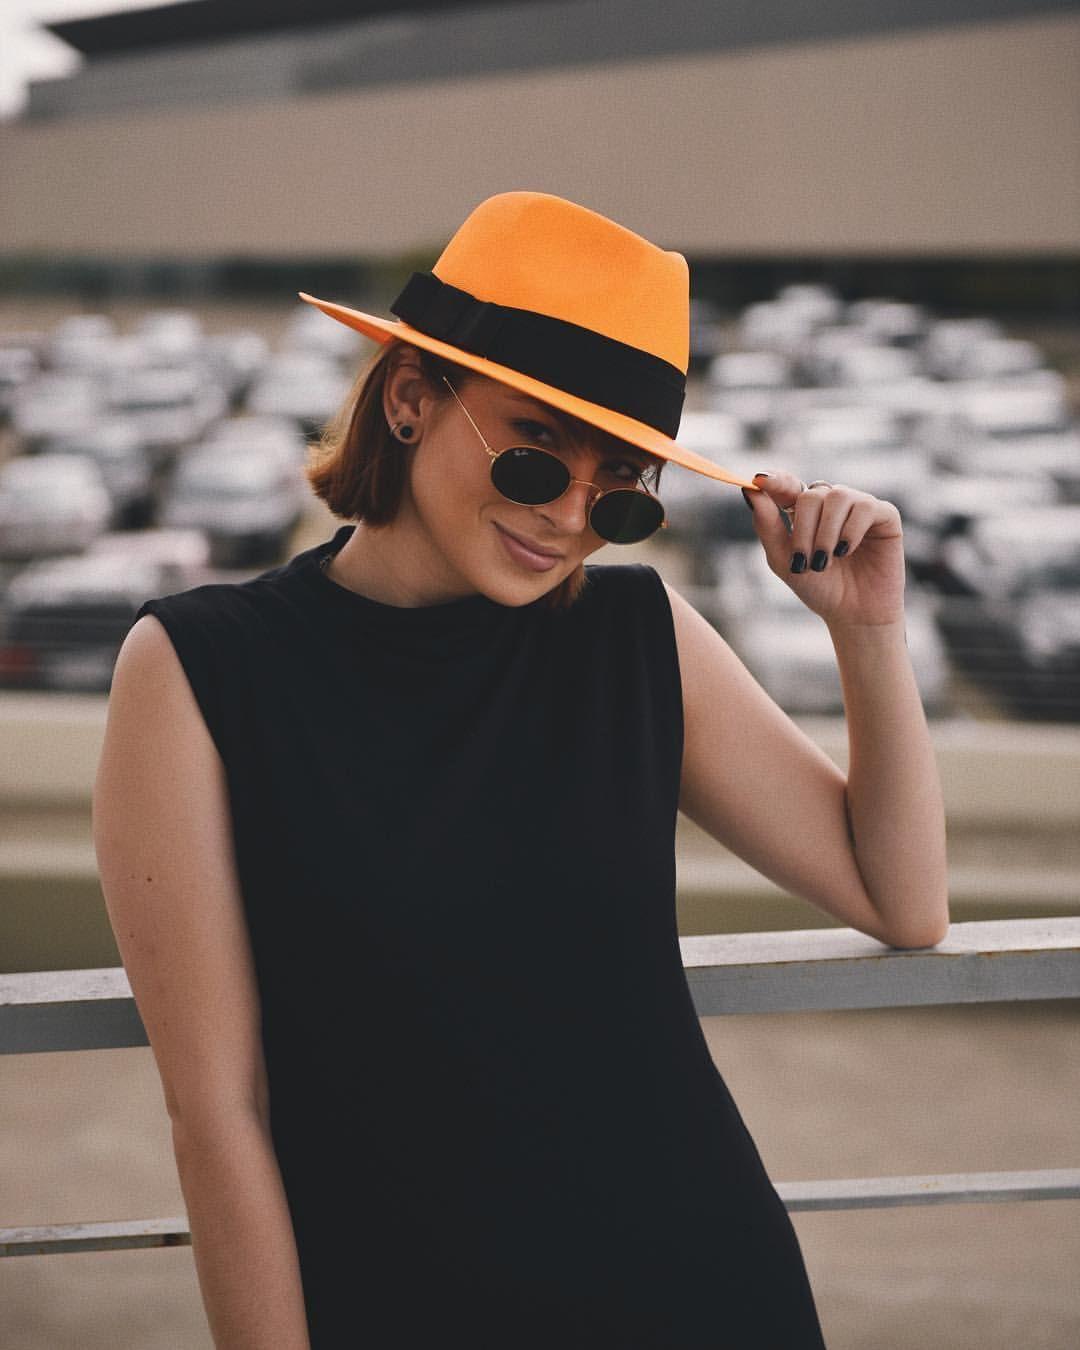 f59faadece934 Insta  vanduarte Tendência neon usada no chapéu fedora laranja e vestido  preto. Como usar chapéu neon! Veja na foto